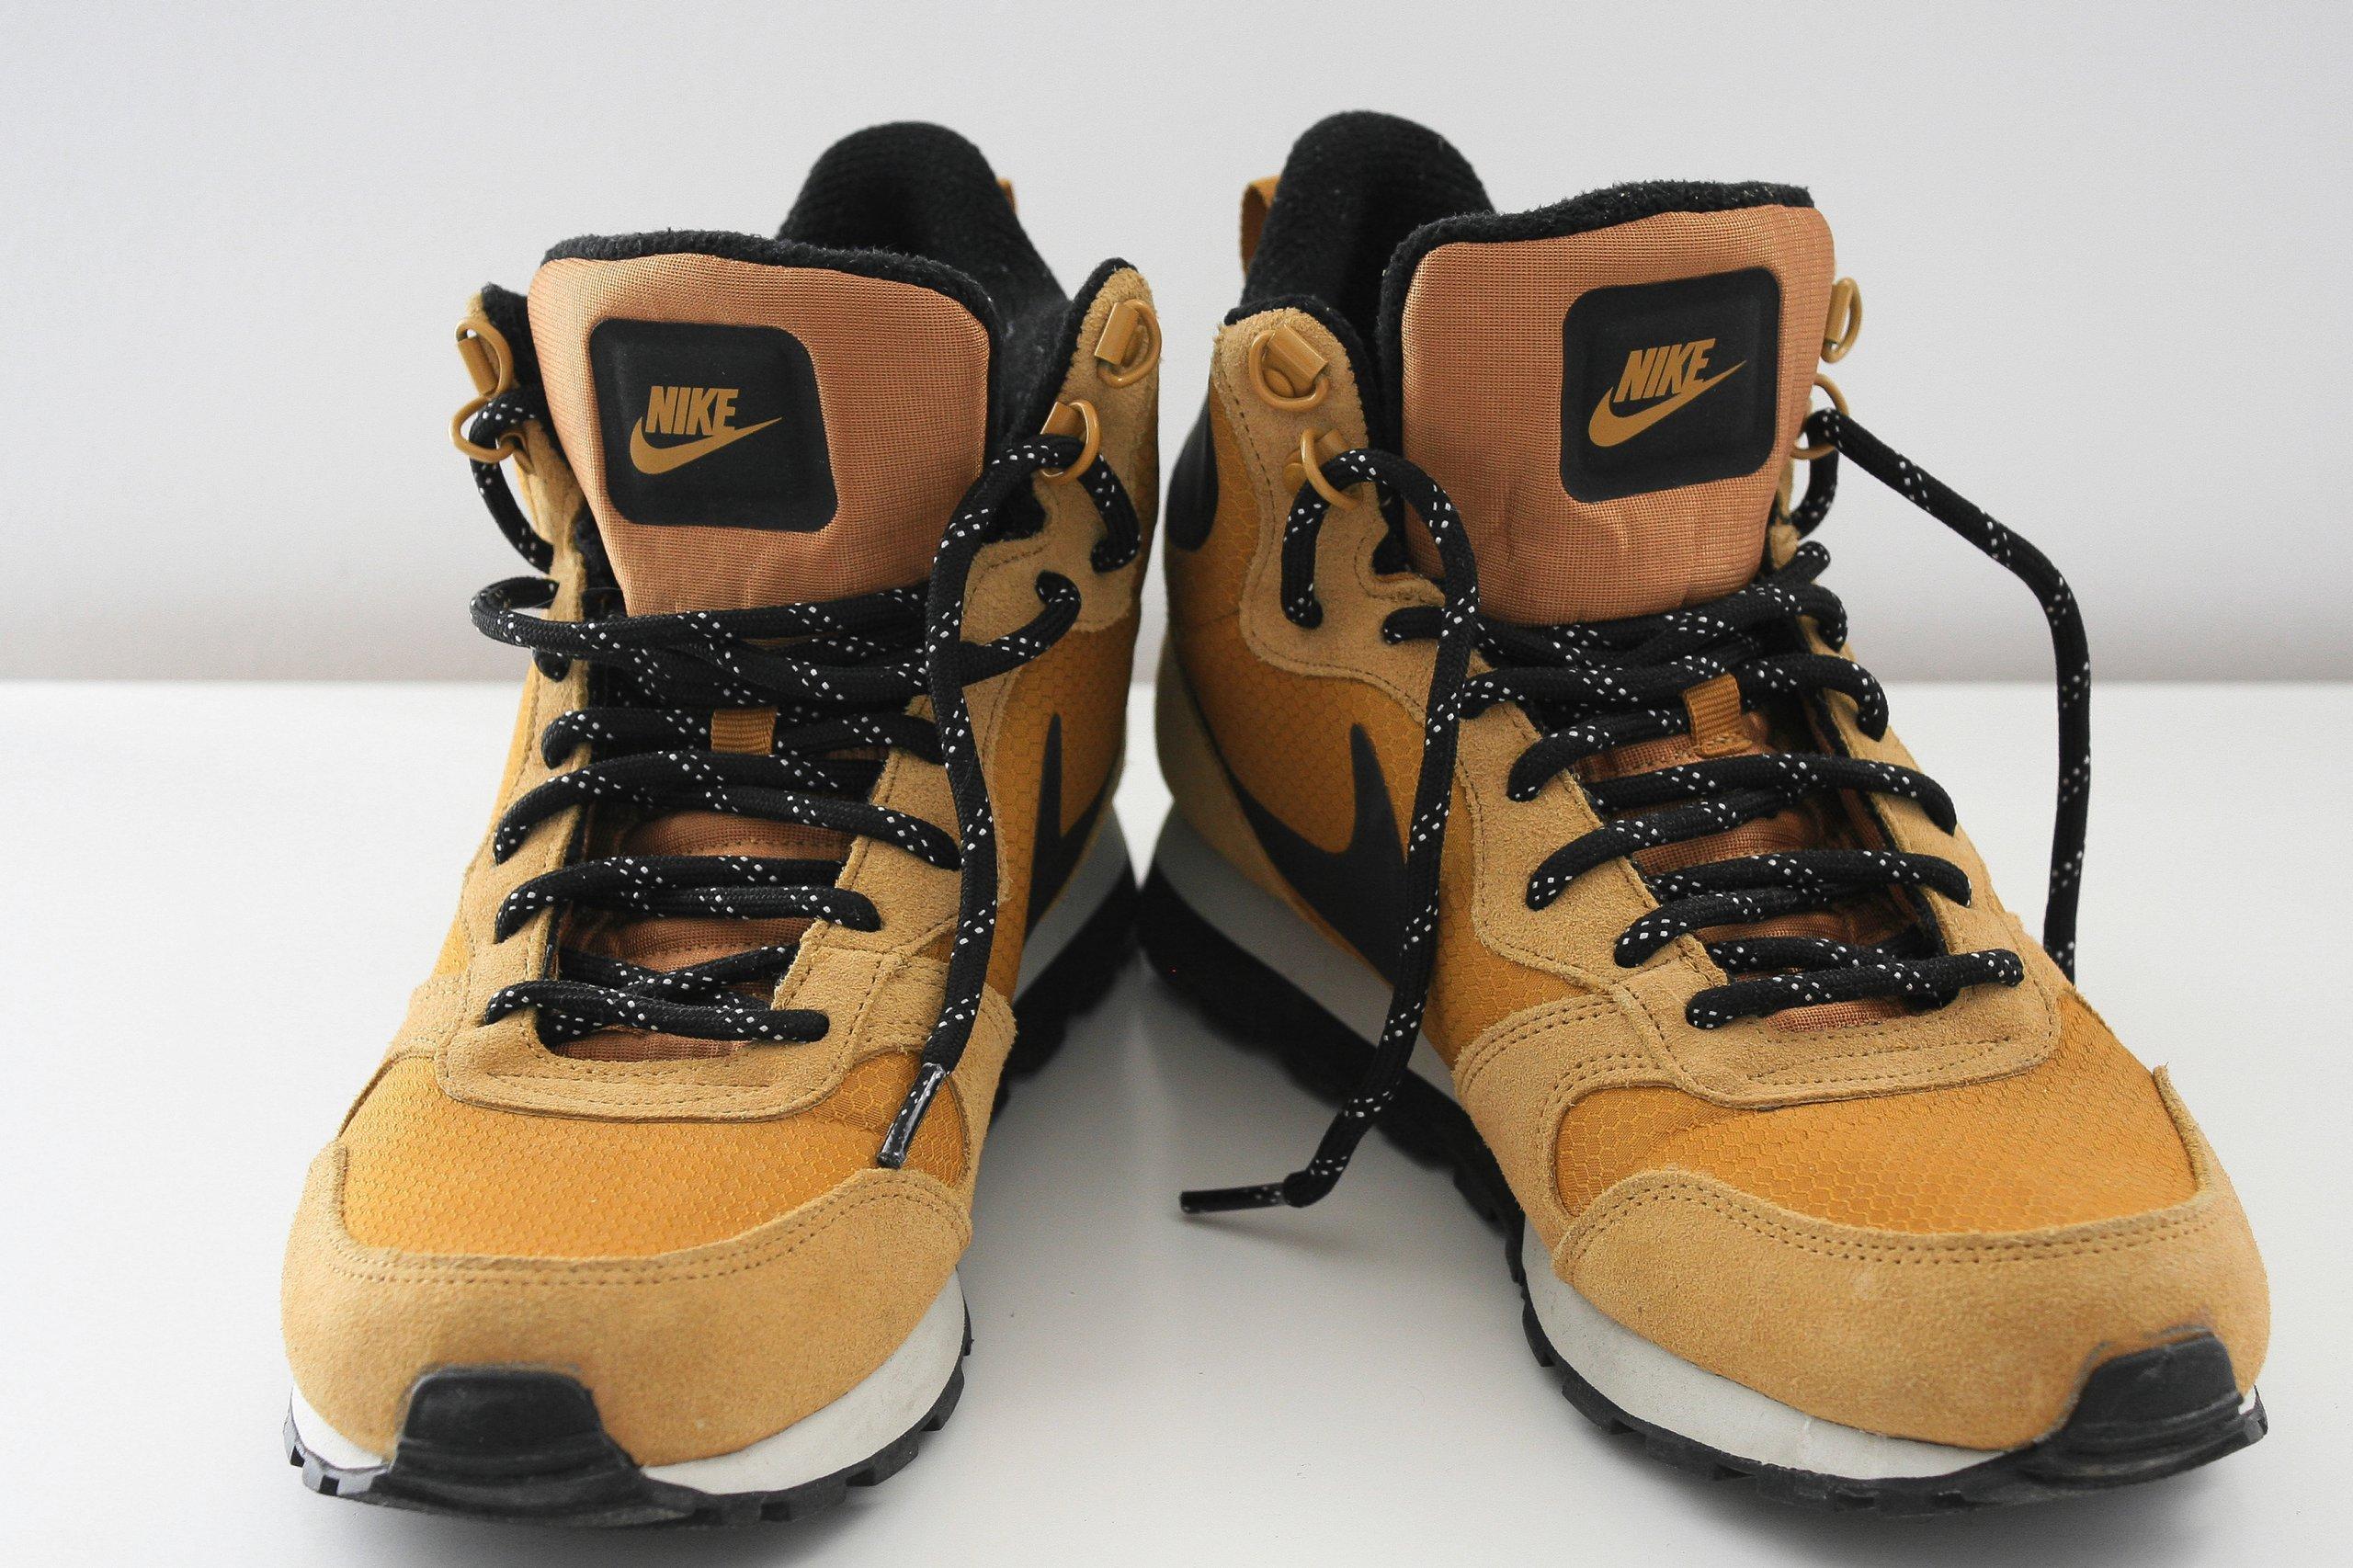 0d630a3fb7 Buty Nike Md Runner 2 Mid Premium r.42.5 - 7240737805 - oficjalne ...